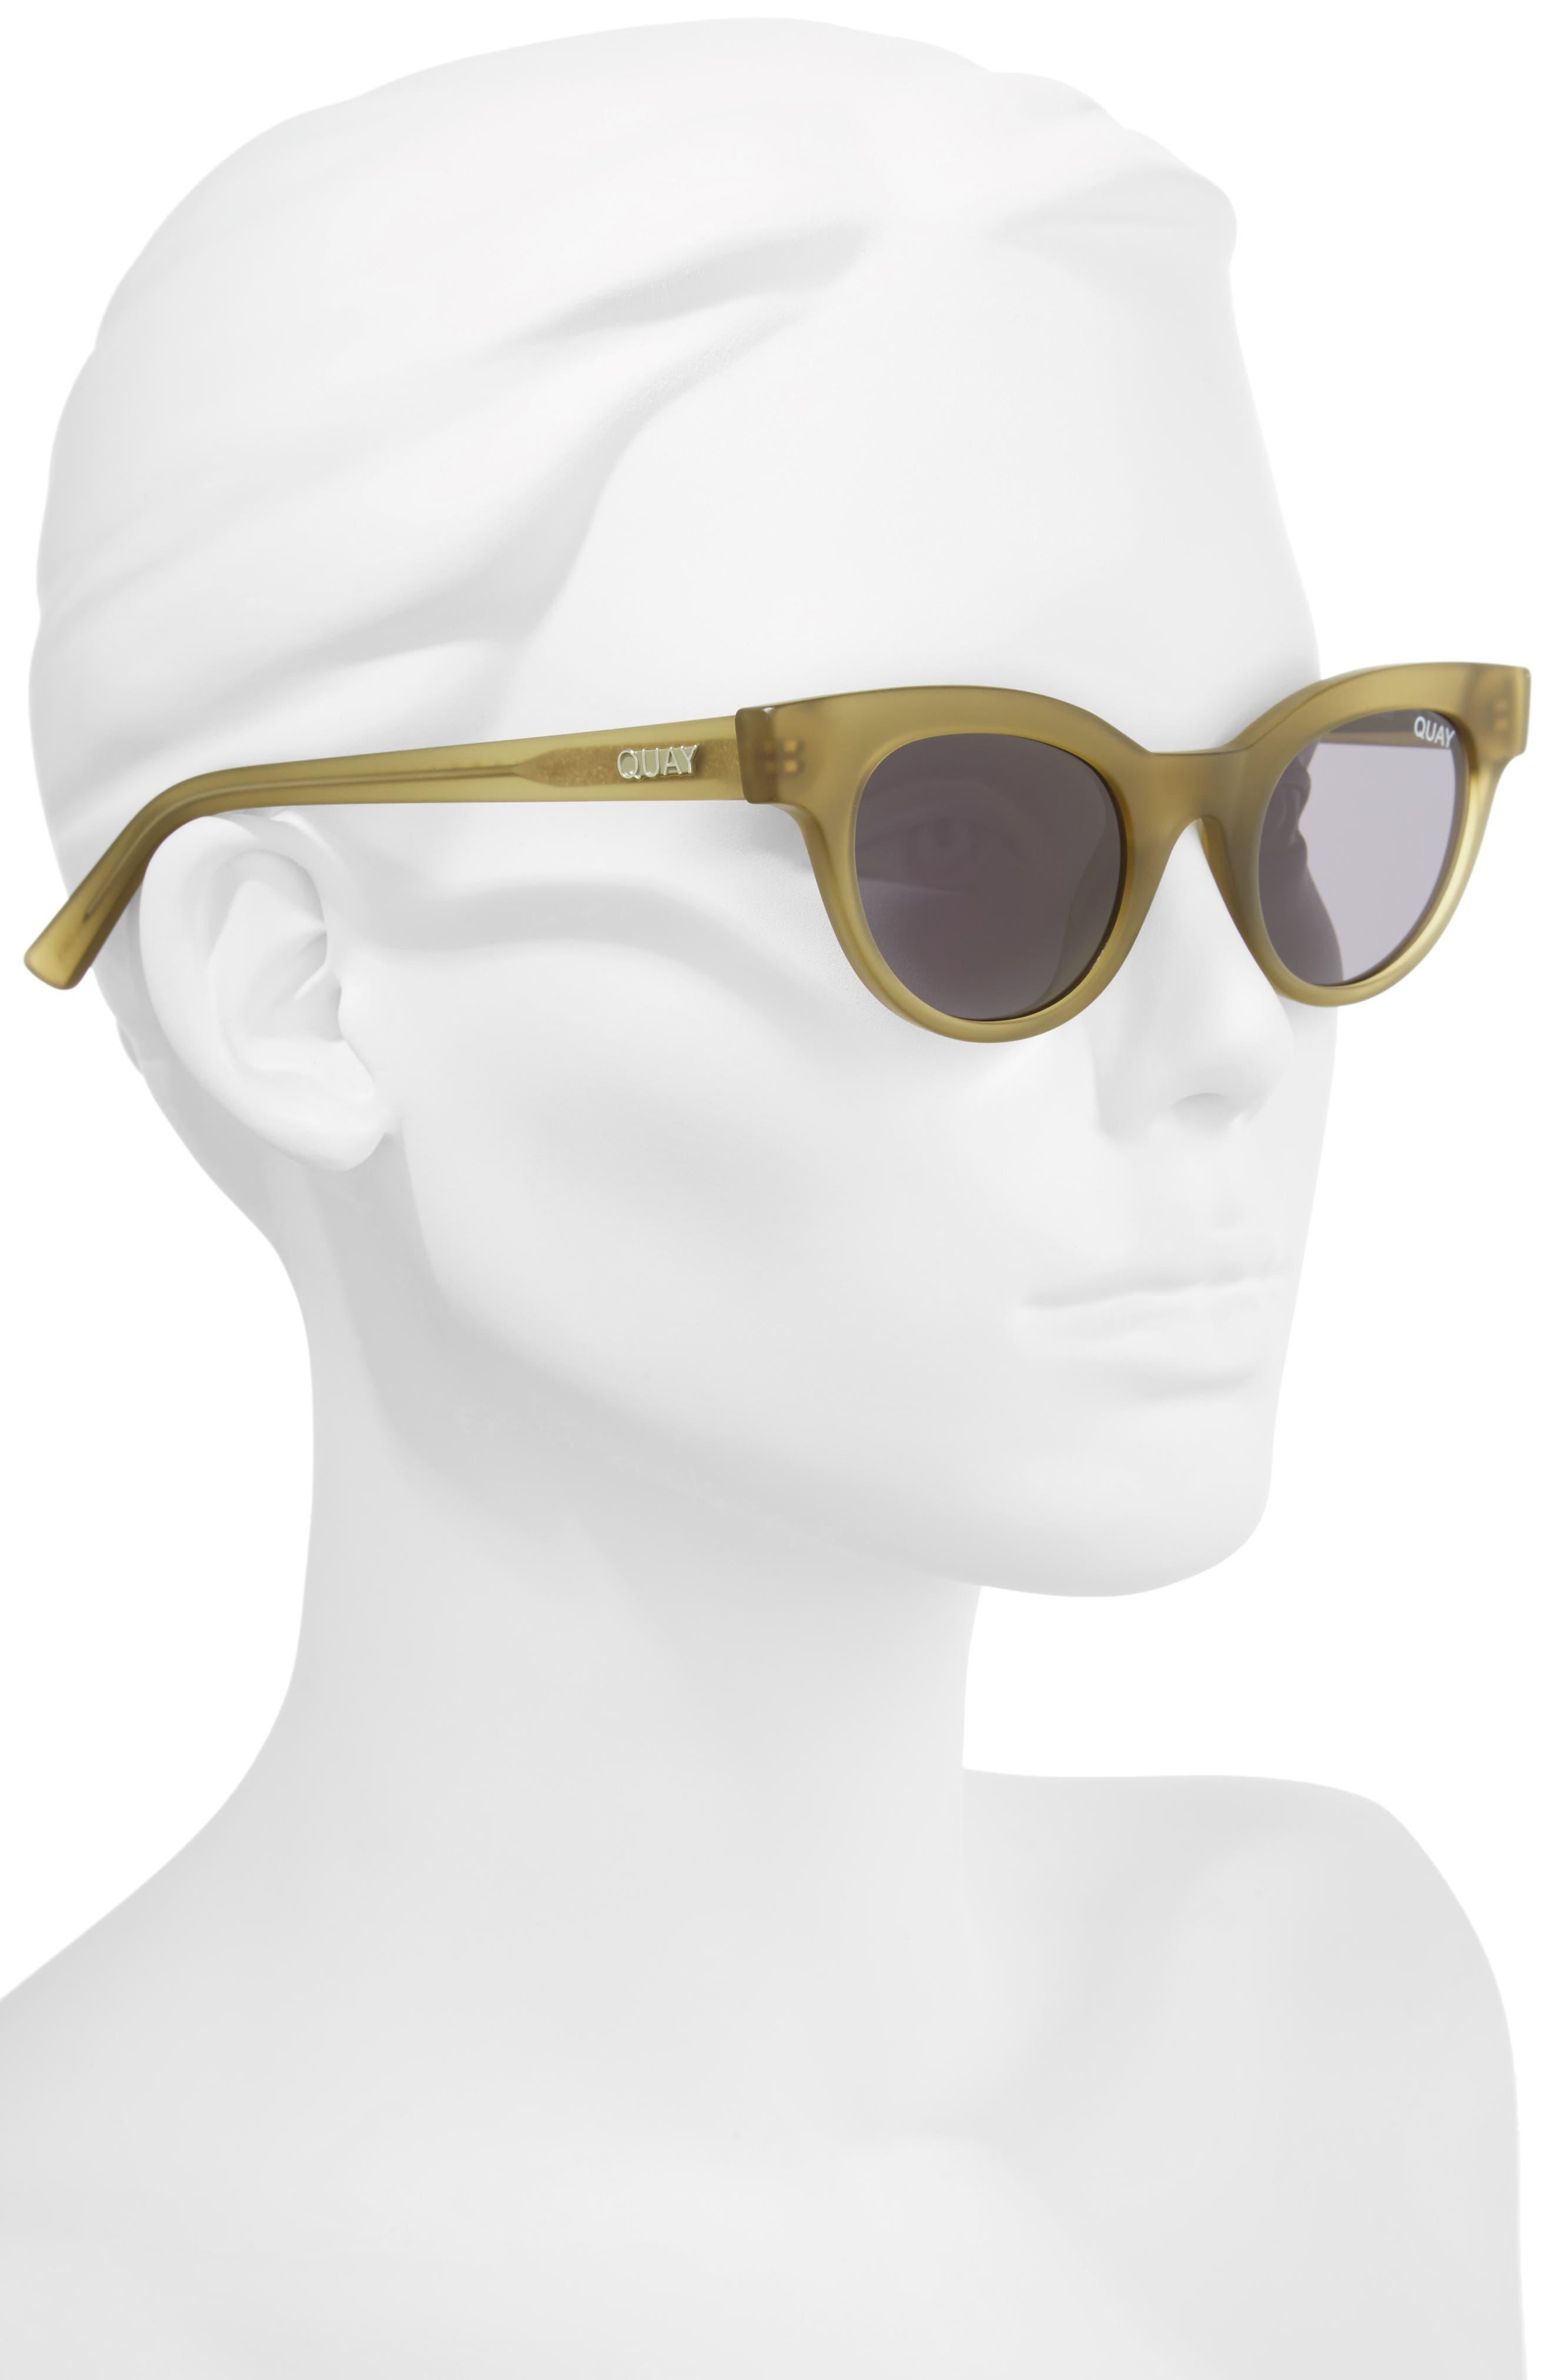 QUAY AUSTRALIA, Starstruck 48mm Cat Eye Sunglasses, Alternate thumbnail 2, color, 300